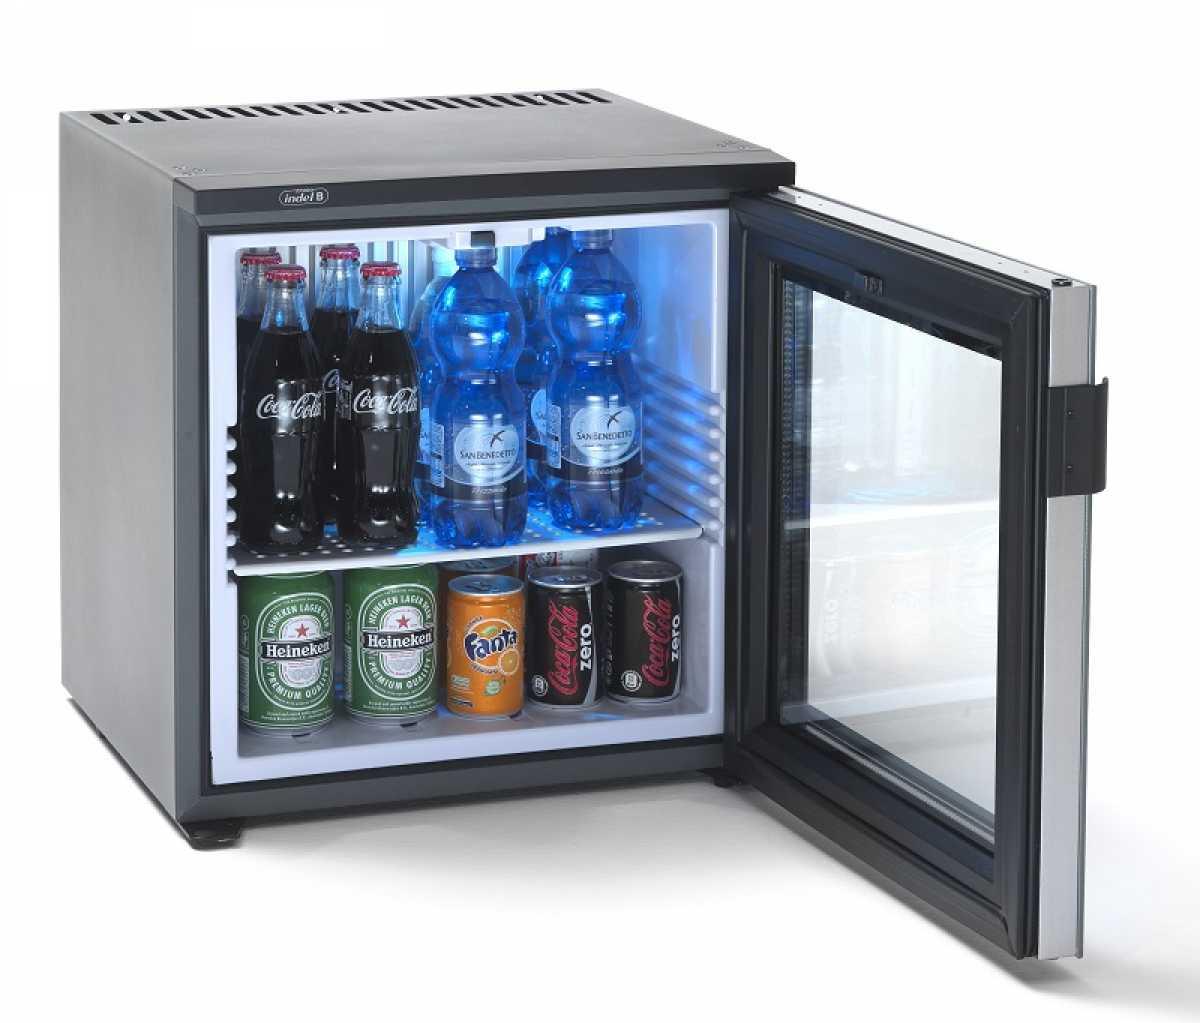 INDEL B Drink 20 Plus PV Cam Kapılı Minibar